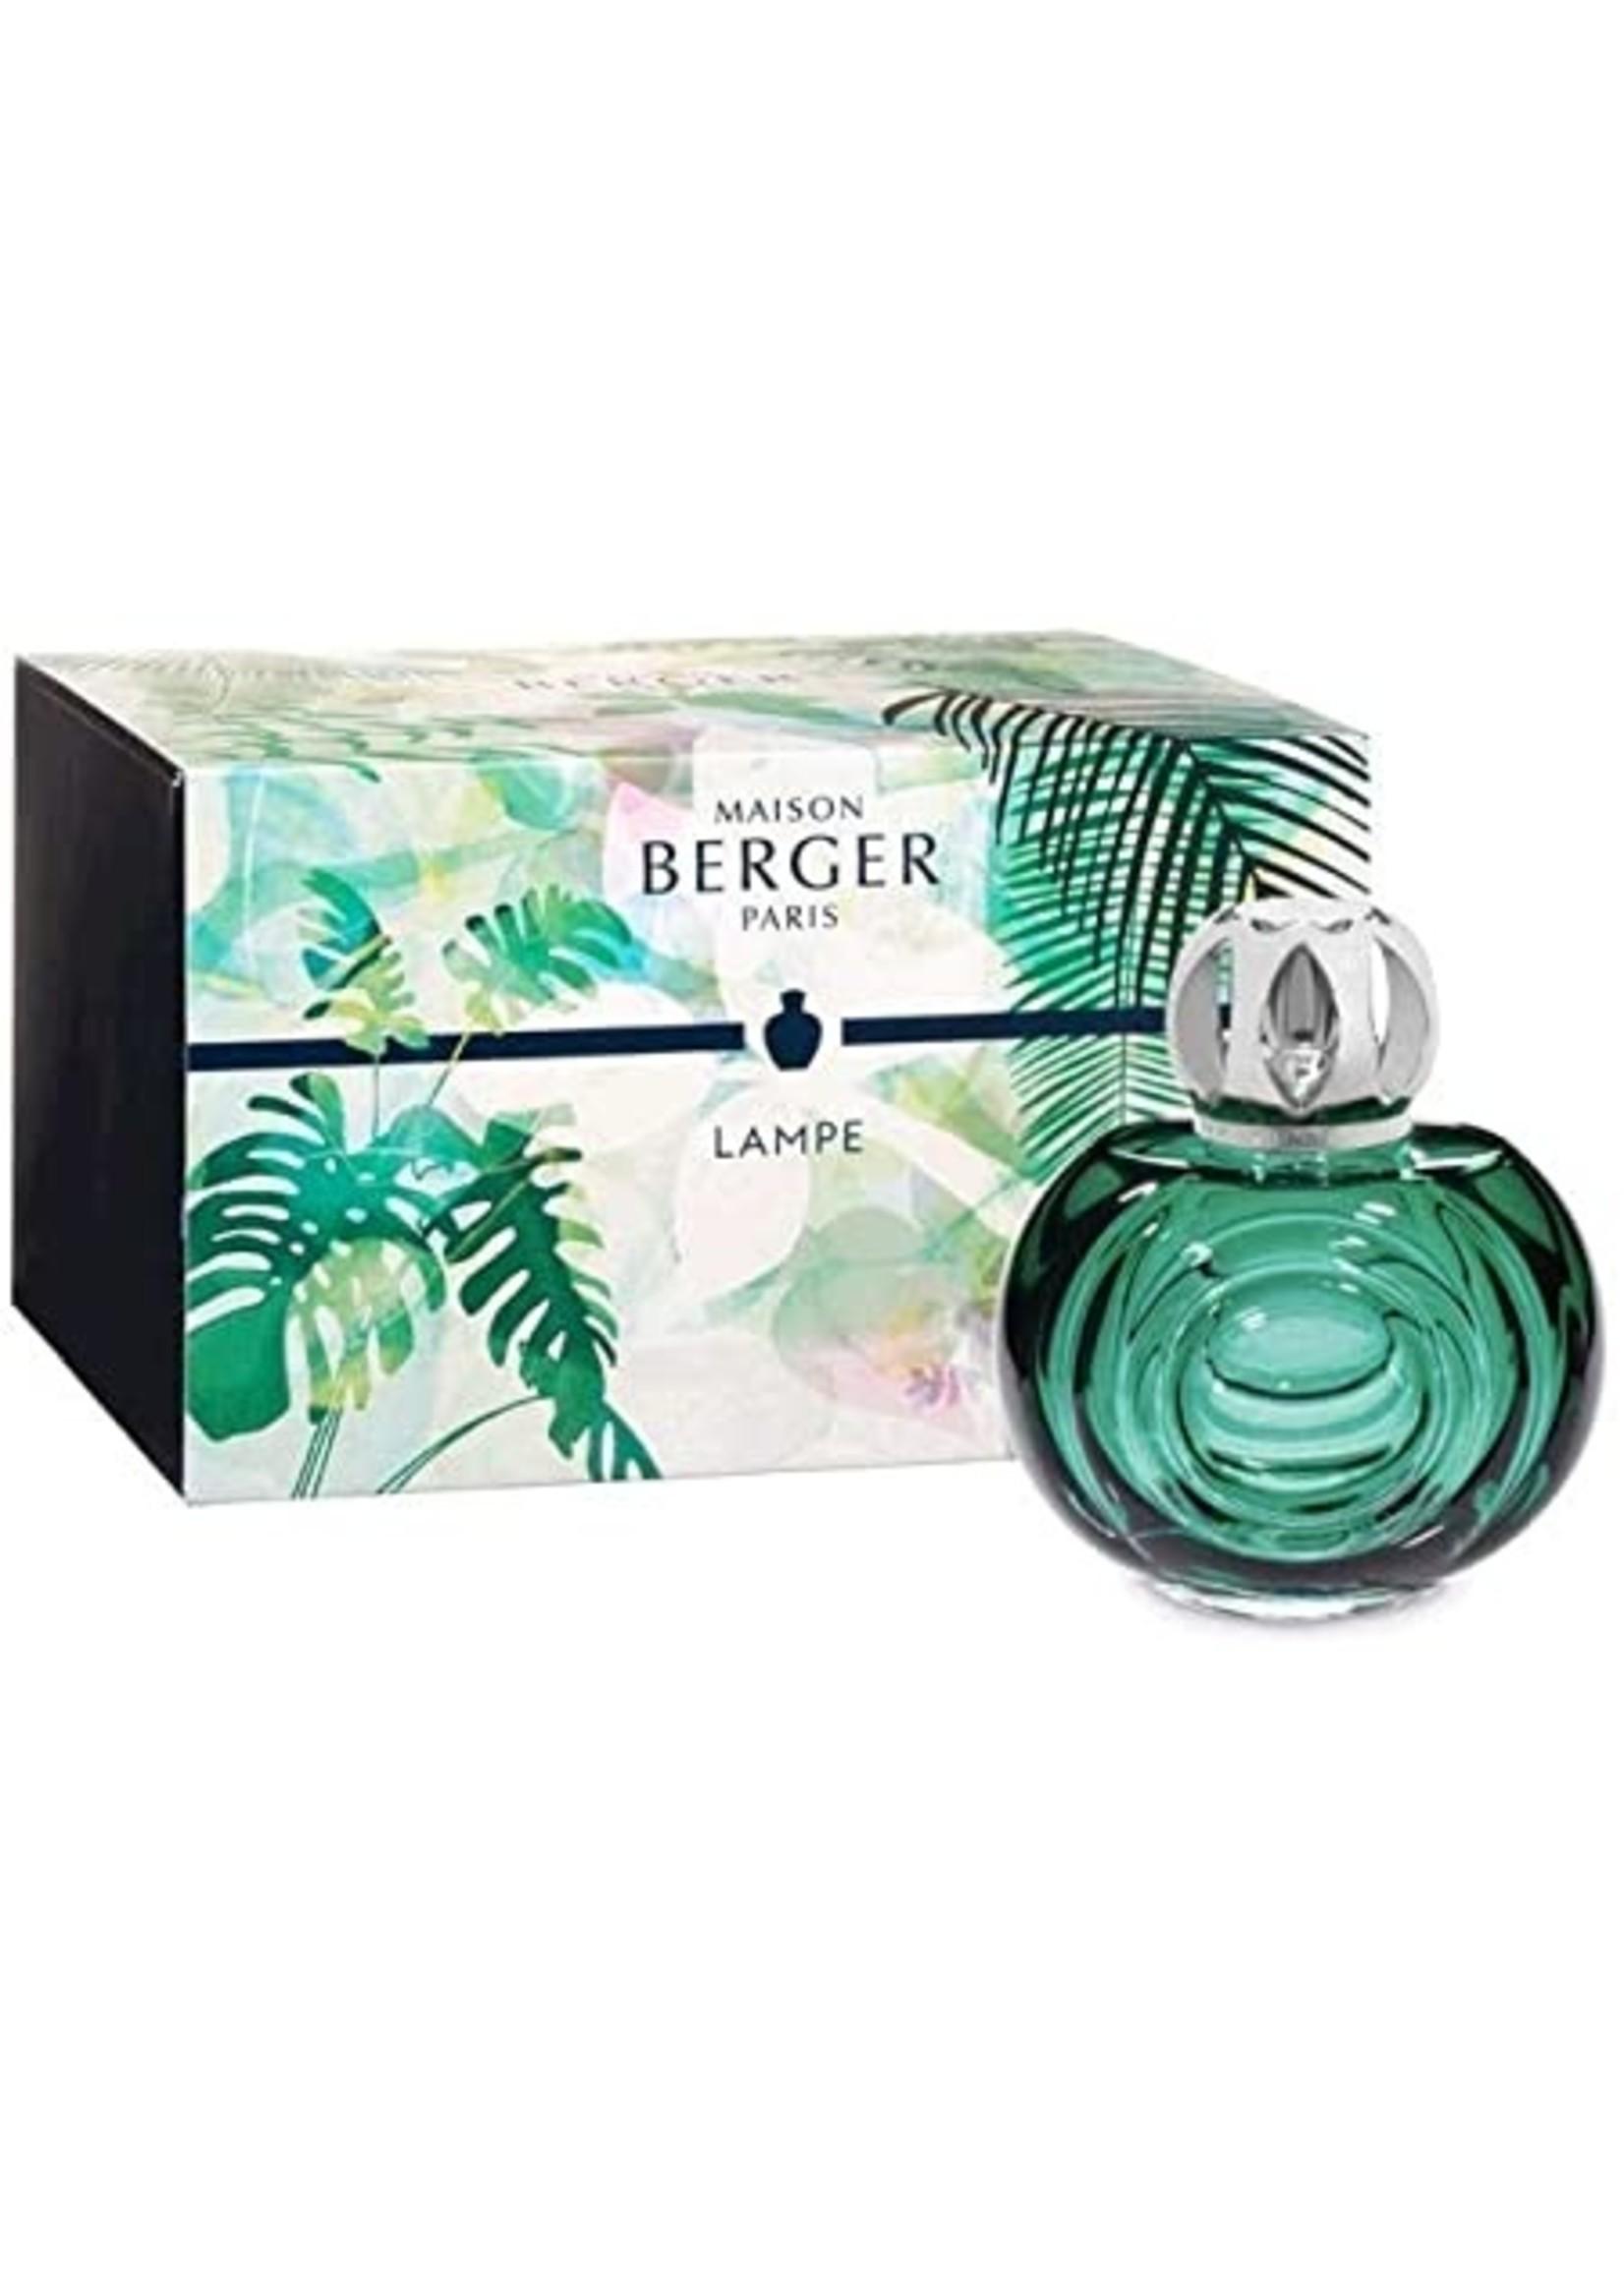 Maison Berger Immersion Green